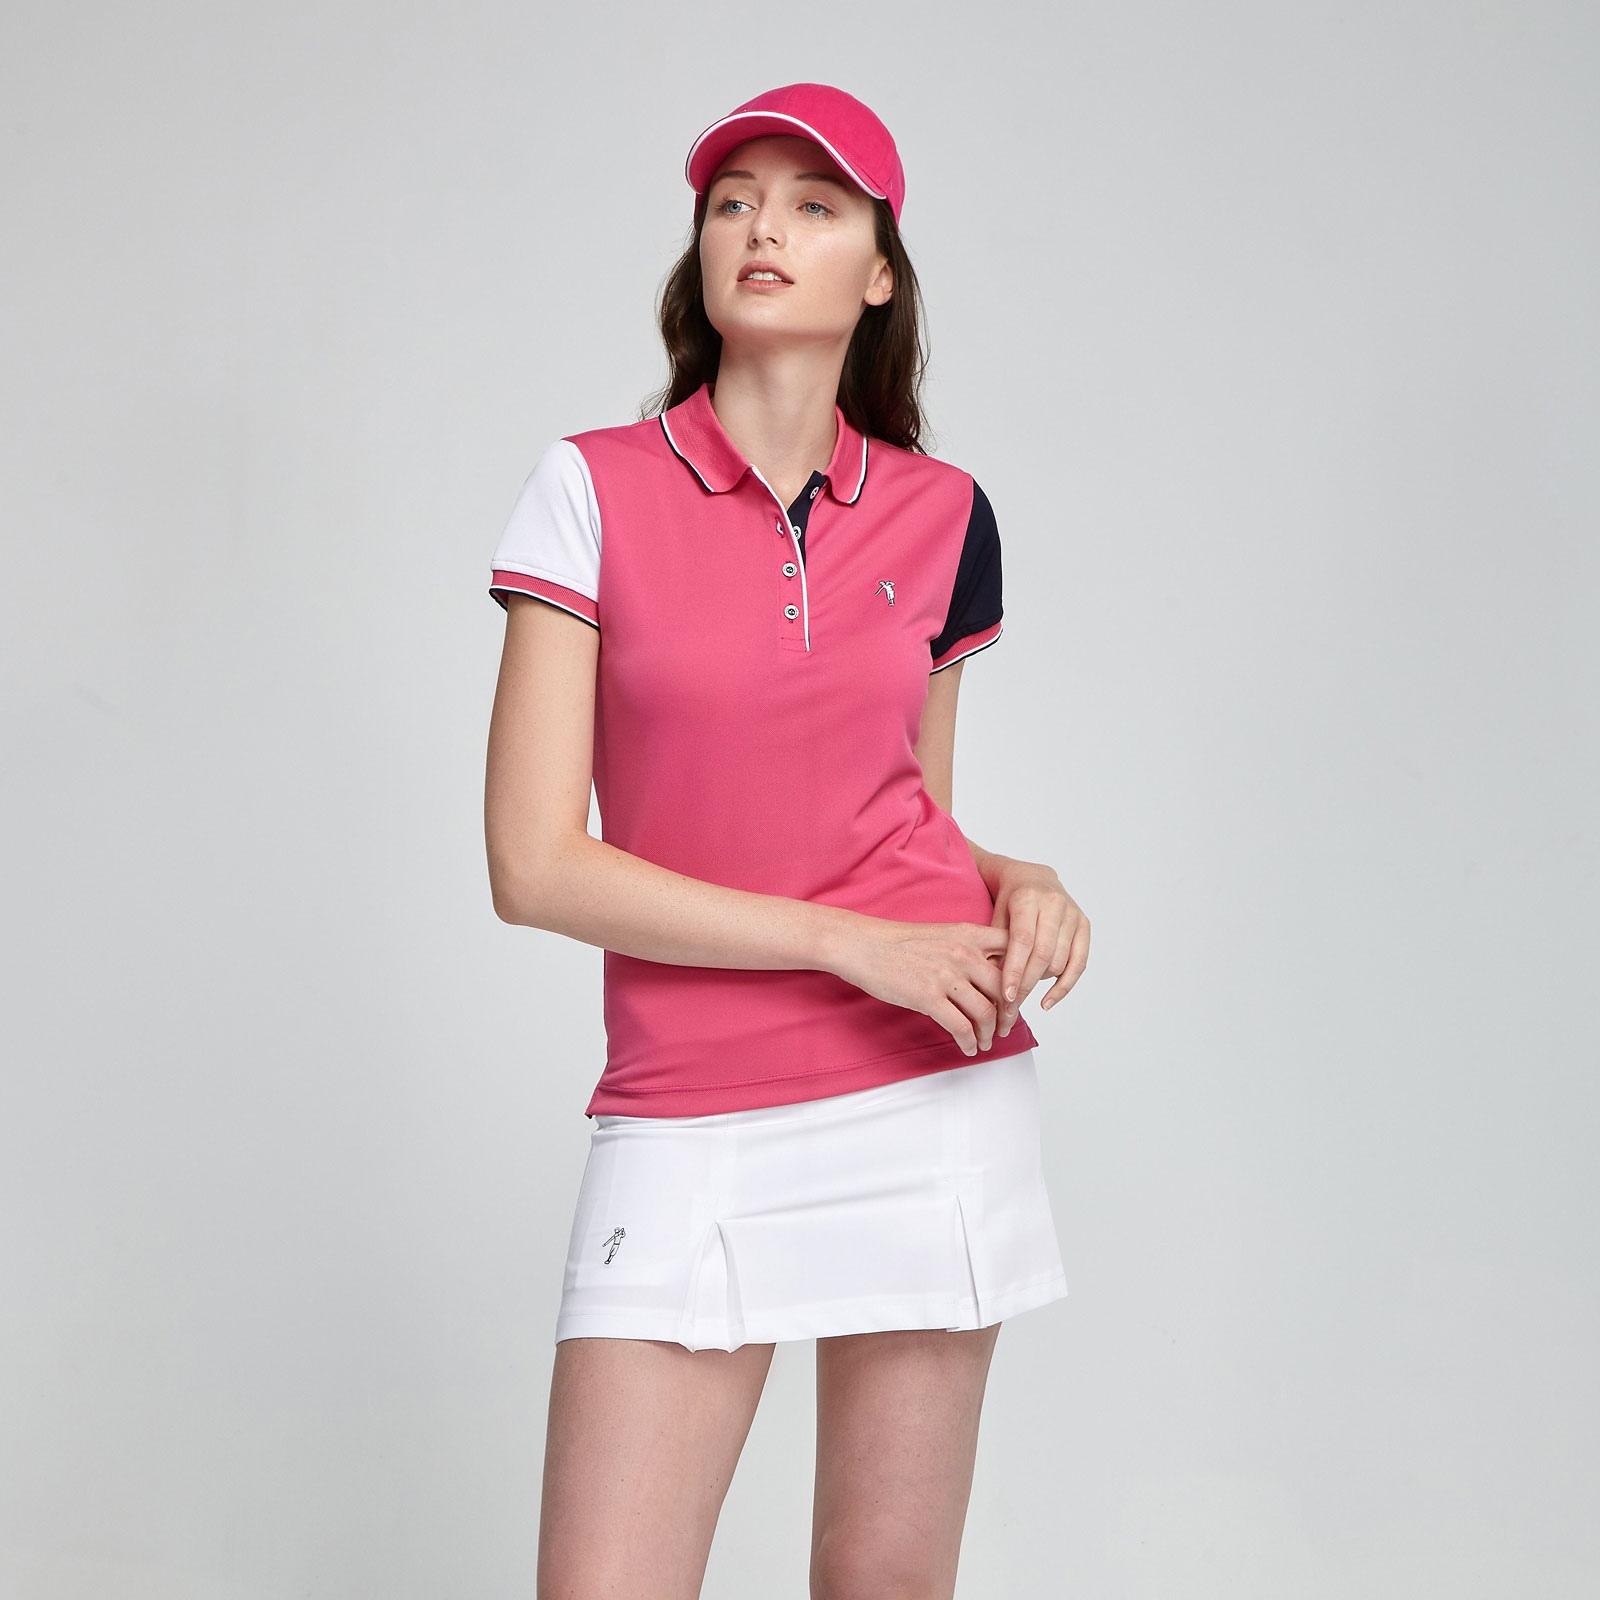 Ropa de golf primavera 19